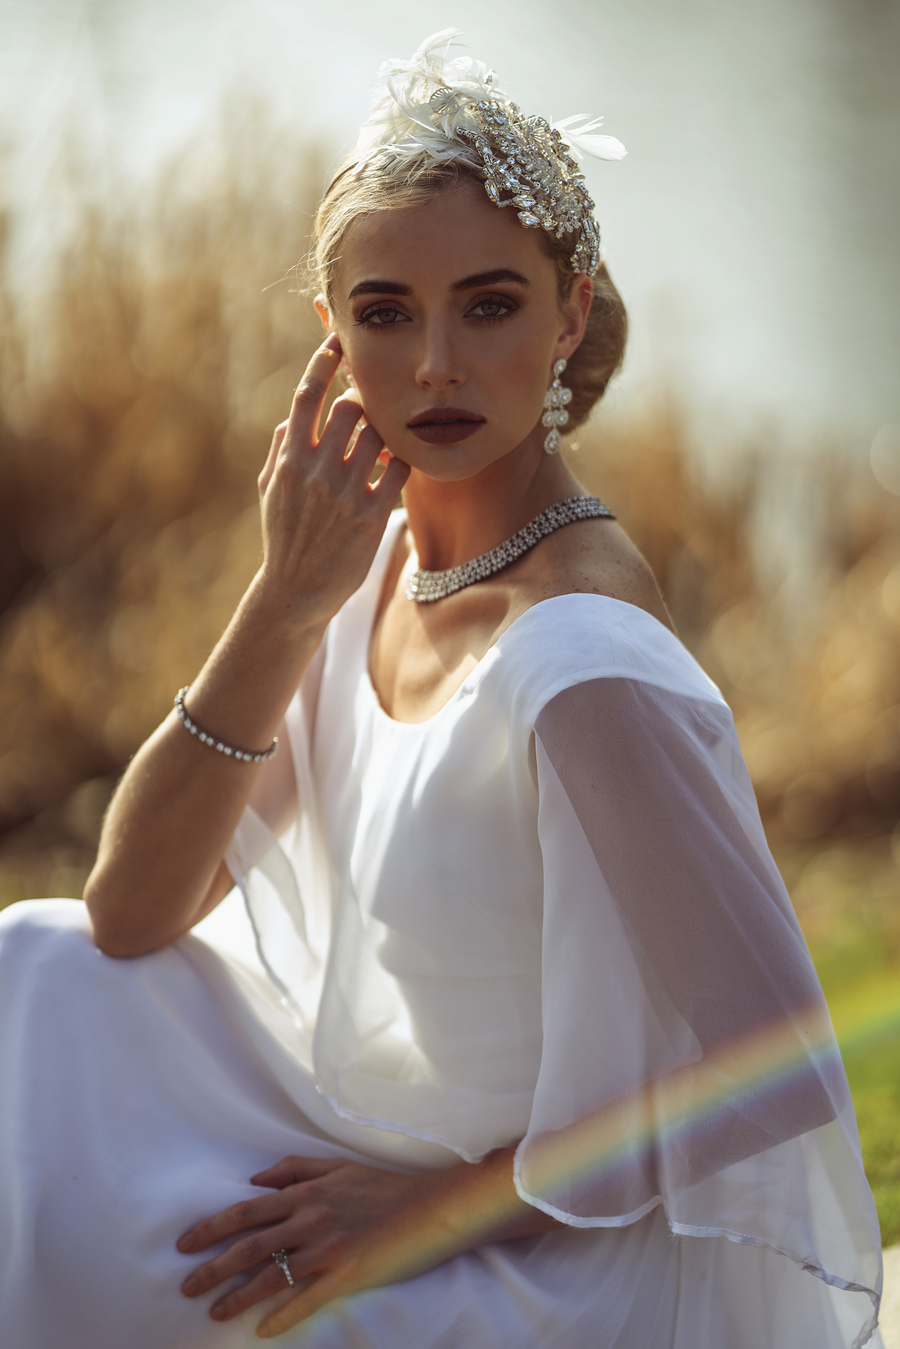 Bridal Portrait / Photography by Kirk Schwarz / Uploaded 27th February 2019 @ 12:03 PM